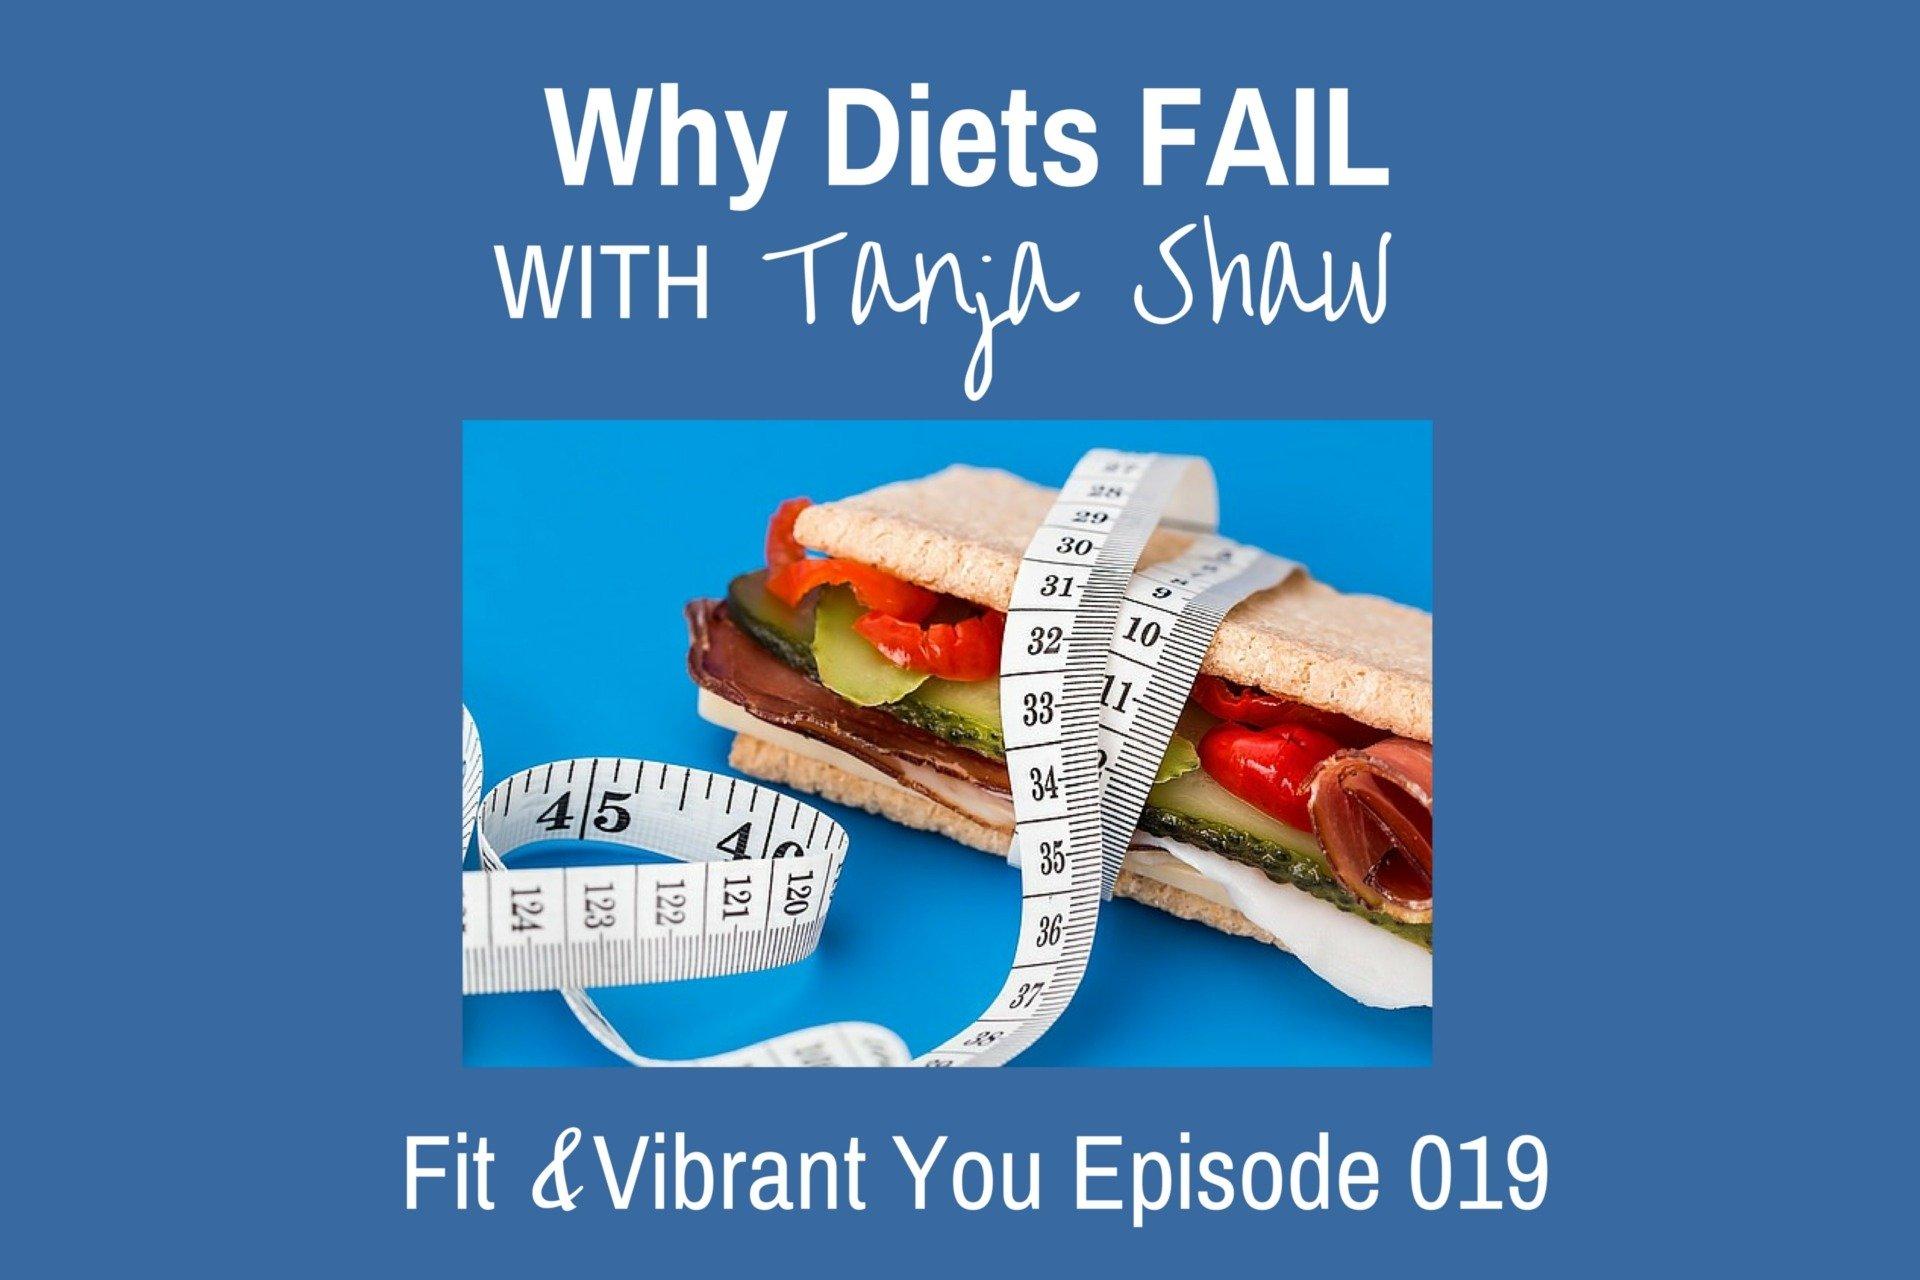 FVY 019: Why Diets FAIL